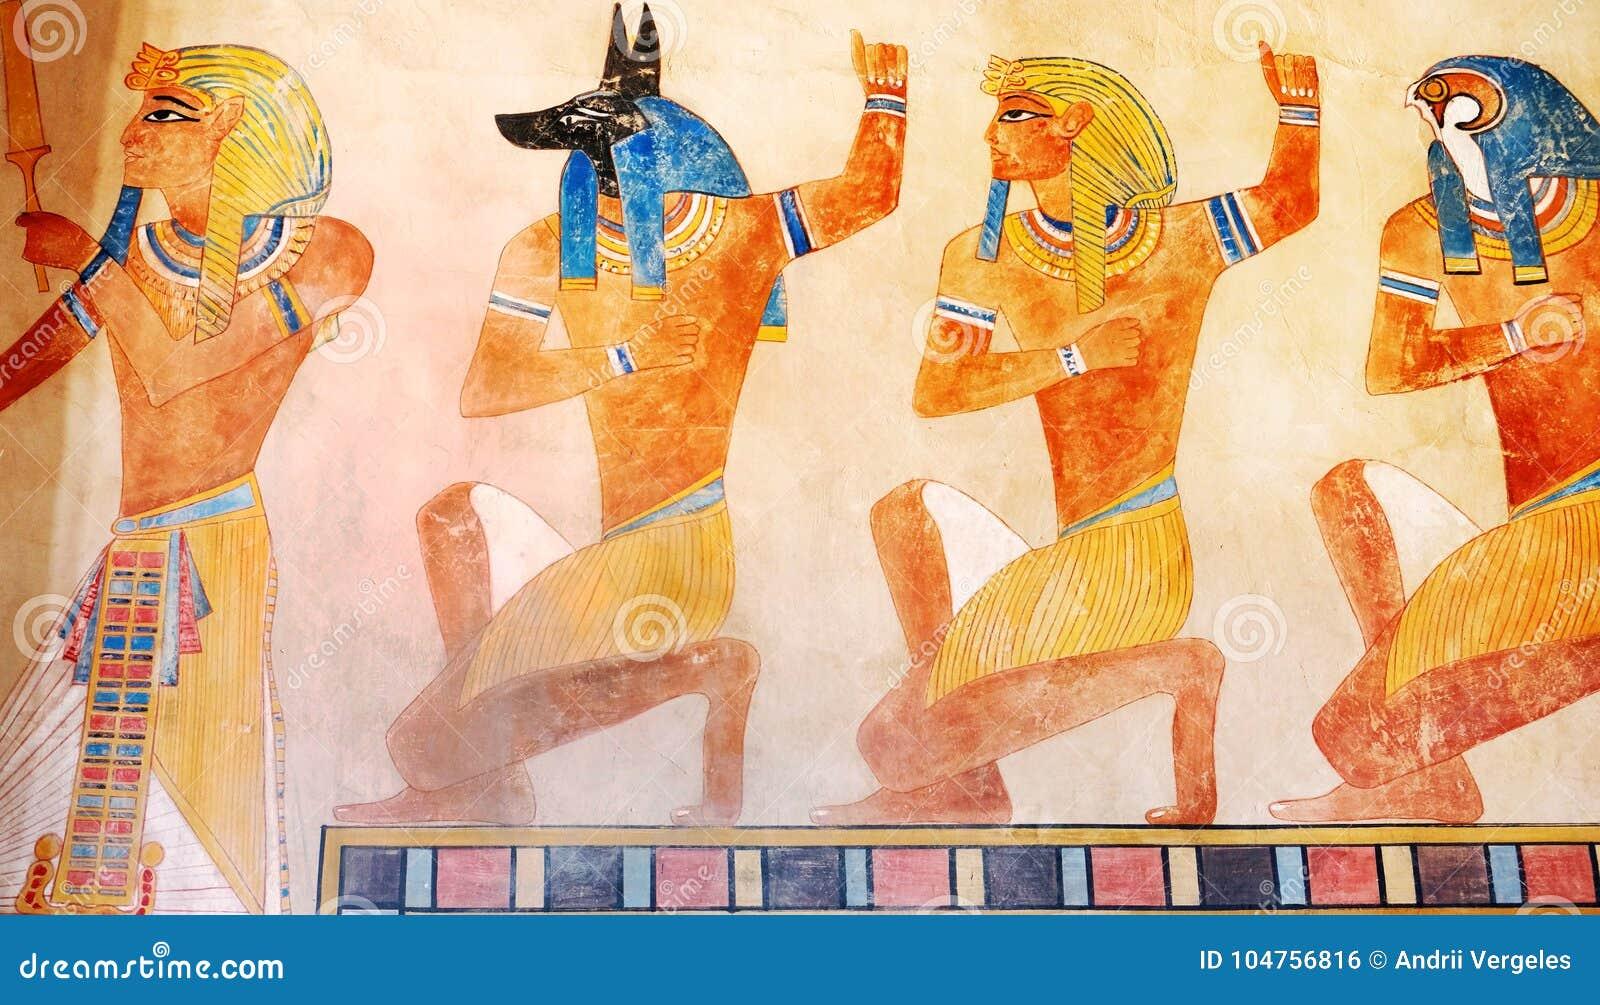 Ancient egypt scene mythology egyptian gods and pharaohs hier download ancient egypt scene mythology egyptian gods and pharaohs hier stock illustration publicscrutiny Image collections